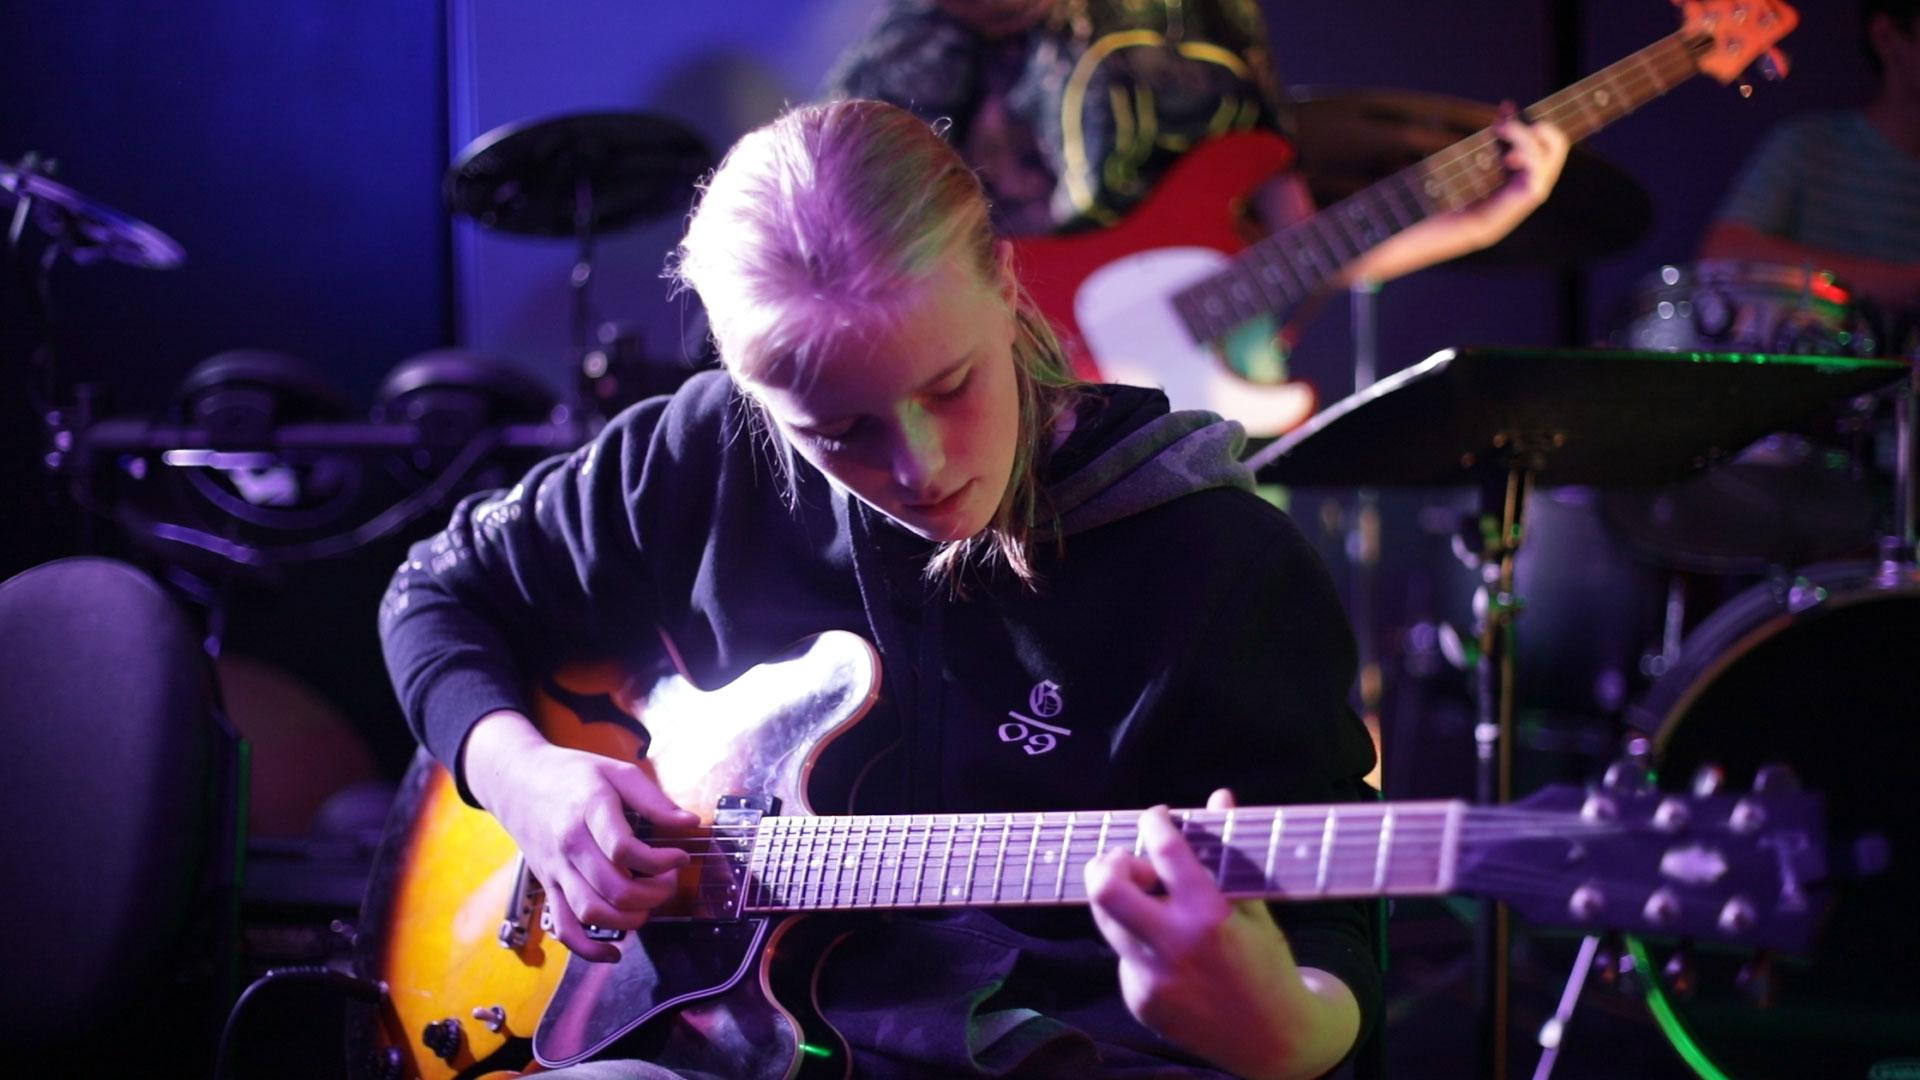 teenage girl playing an electric guitar